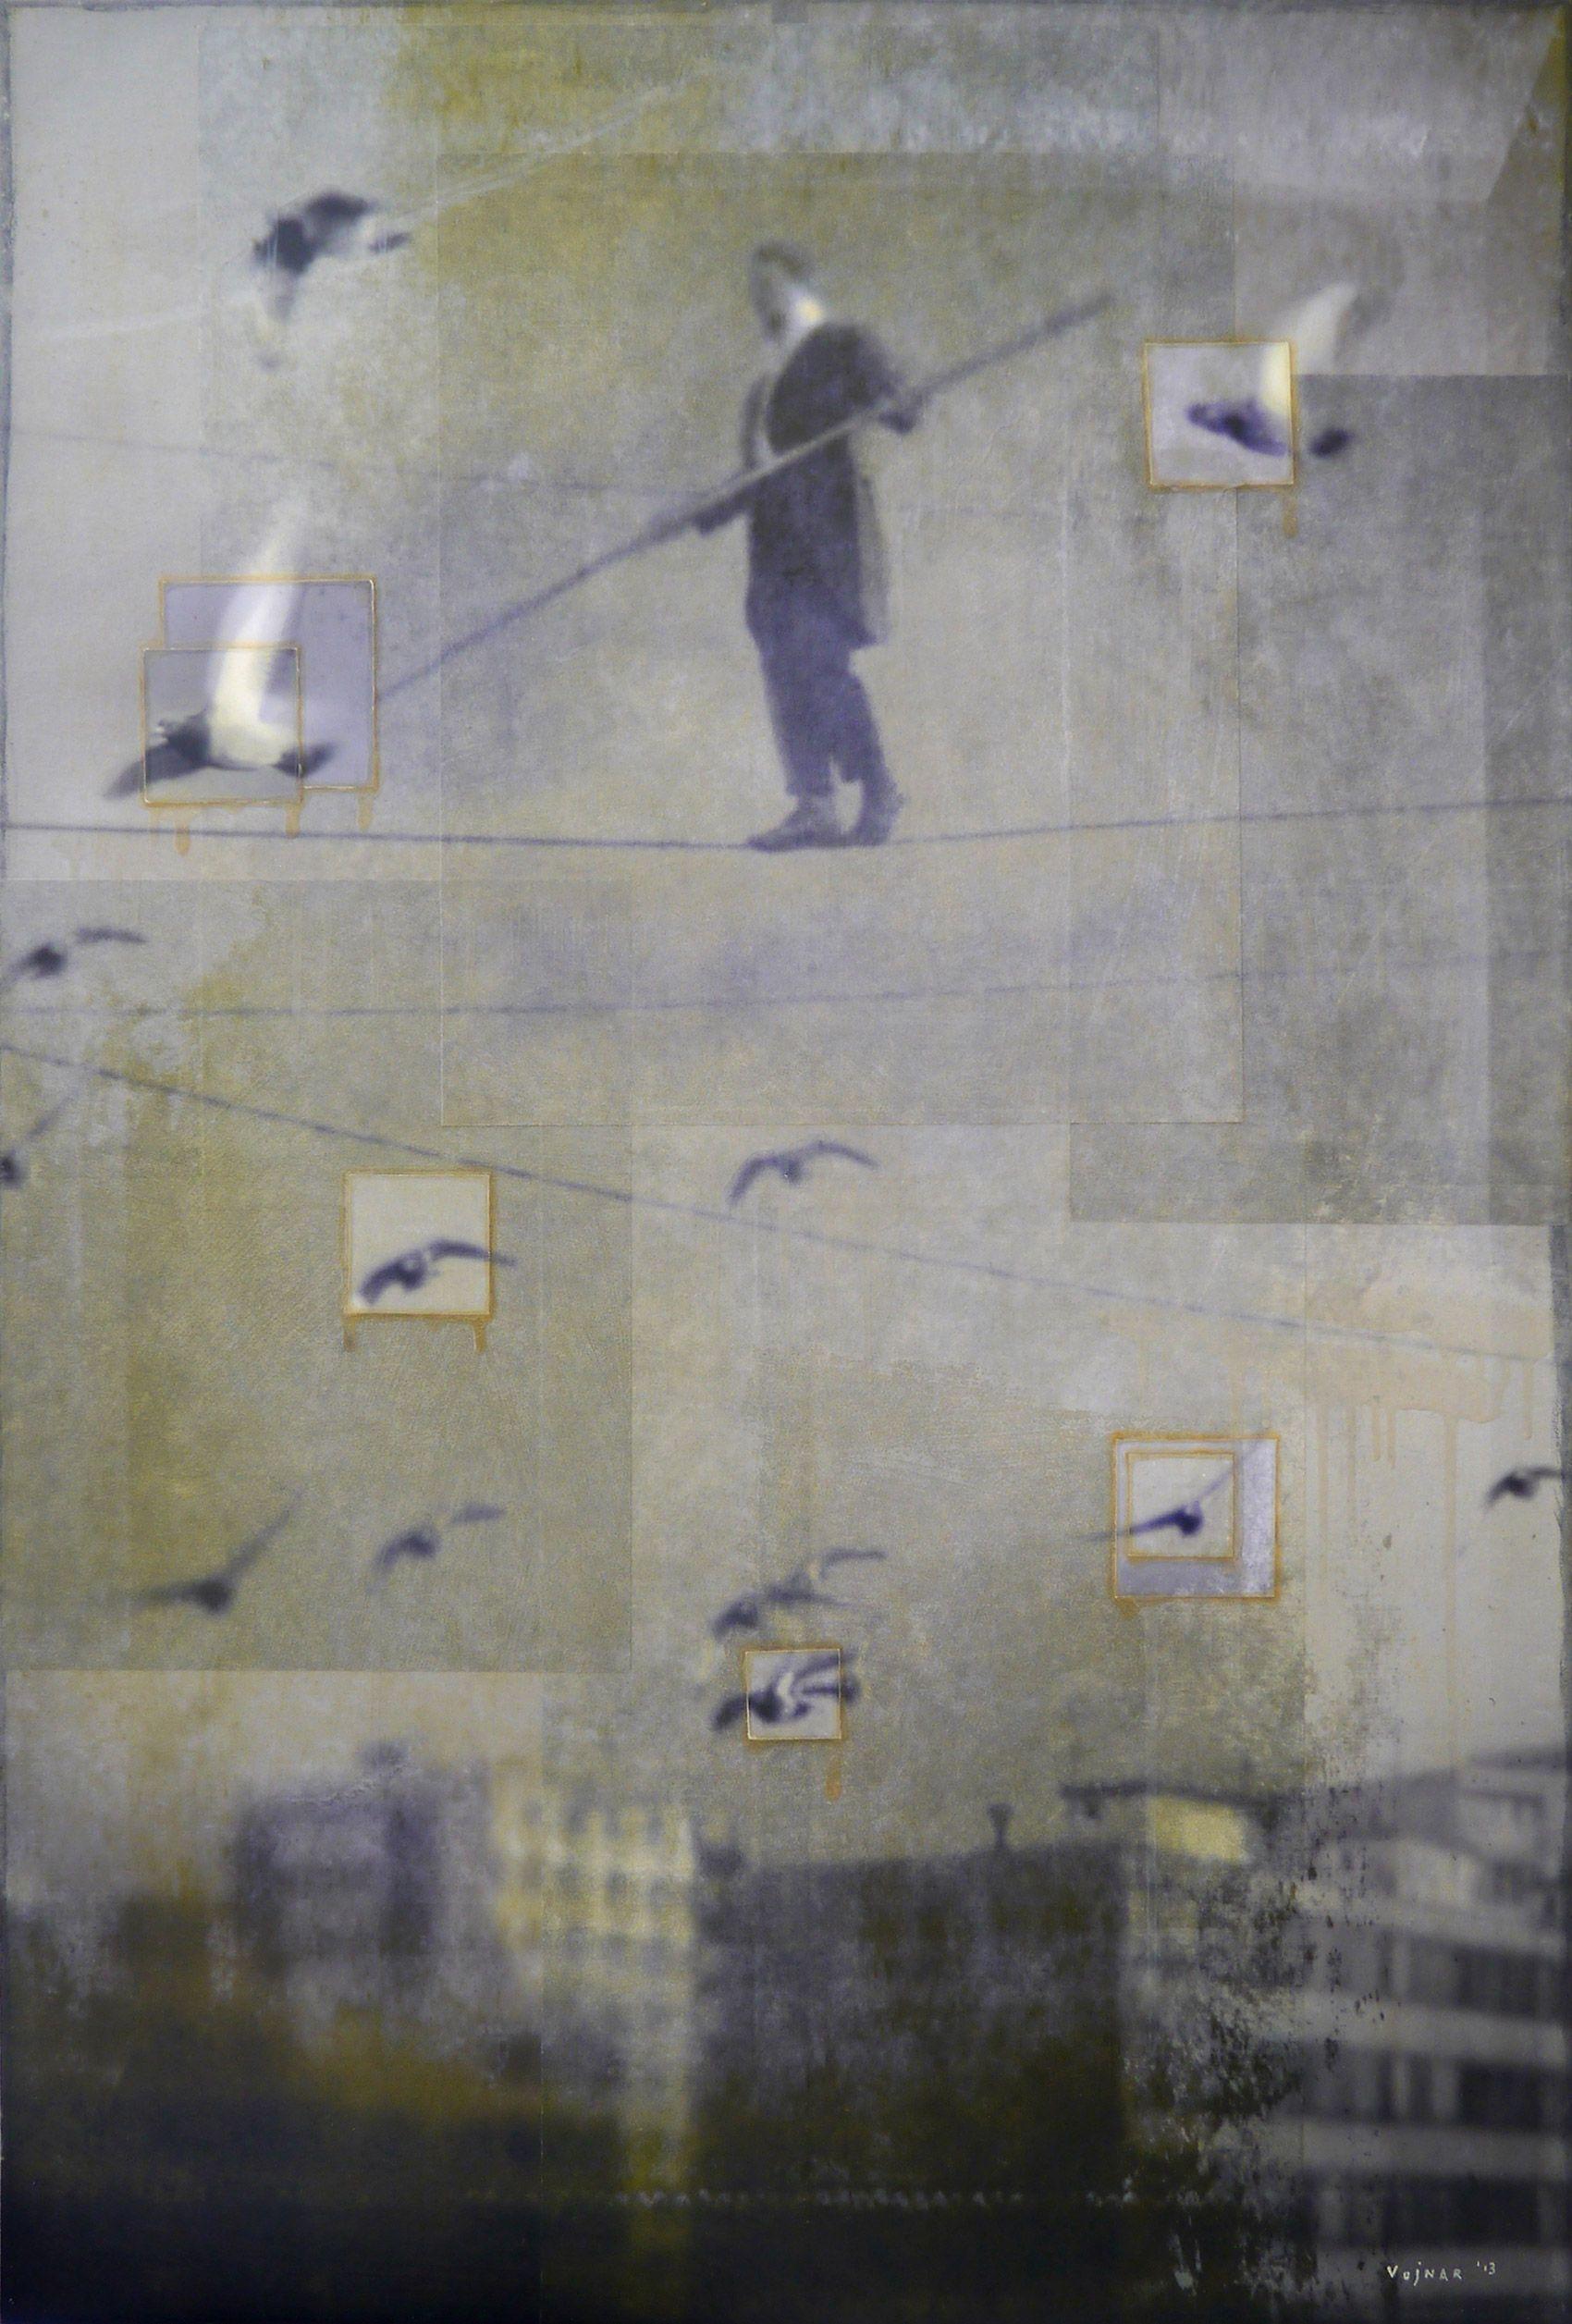 acrobat (prague)